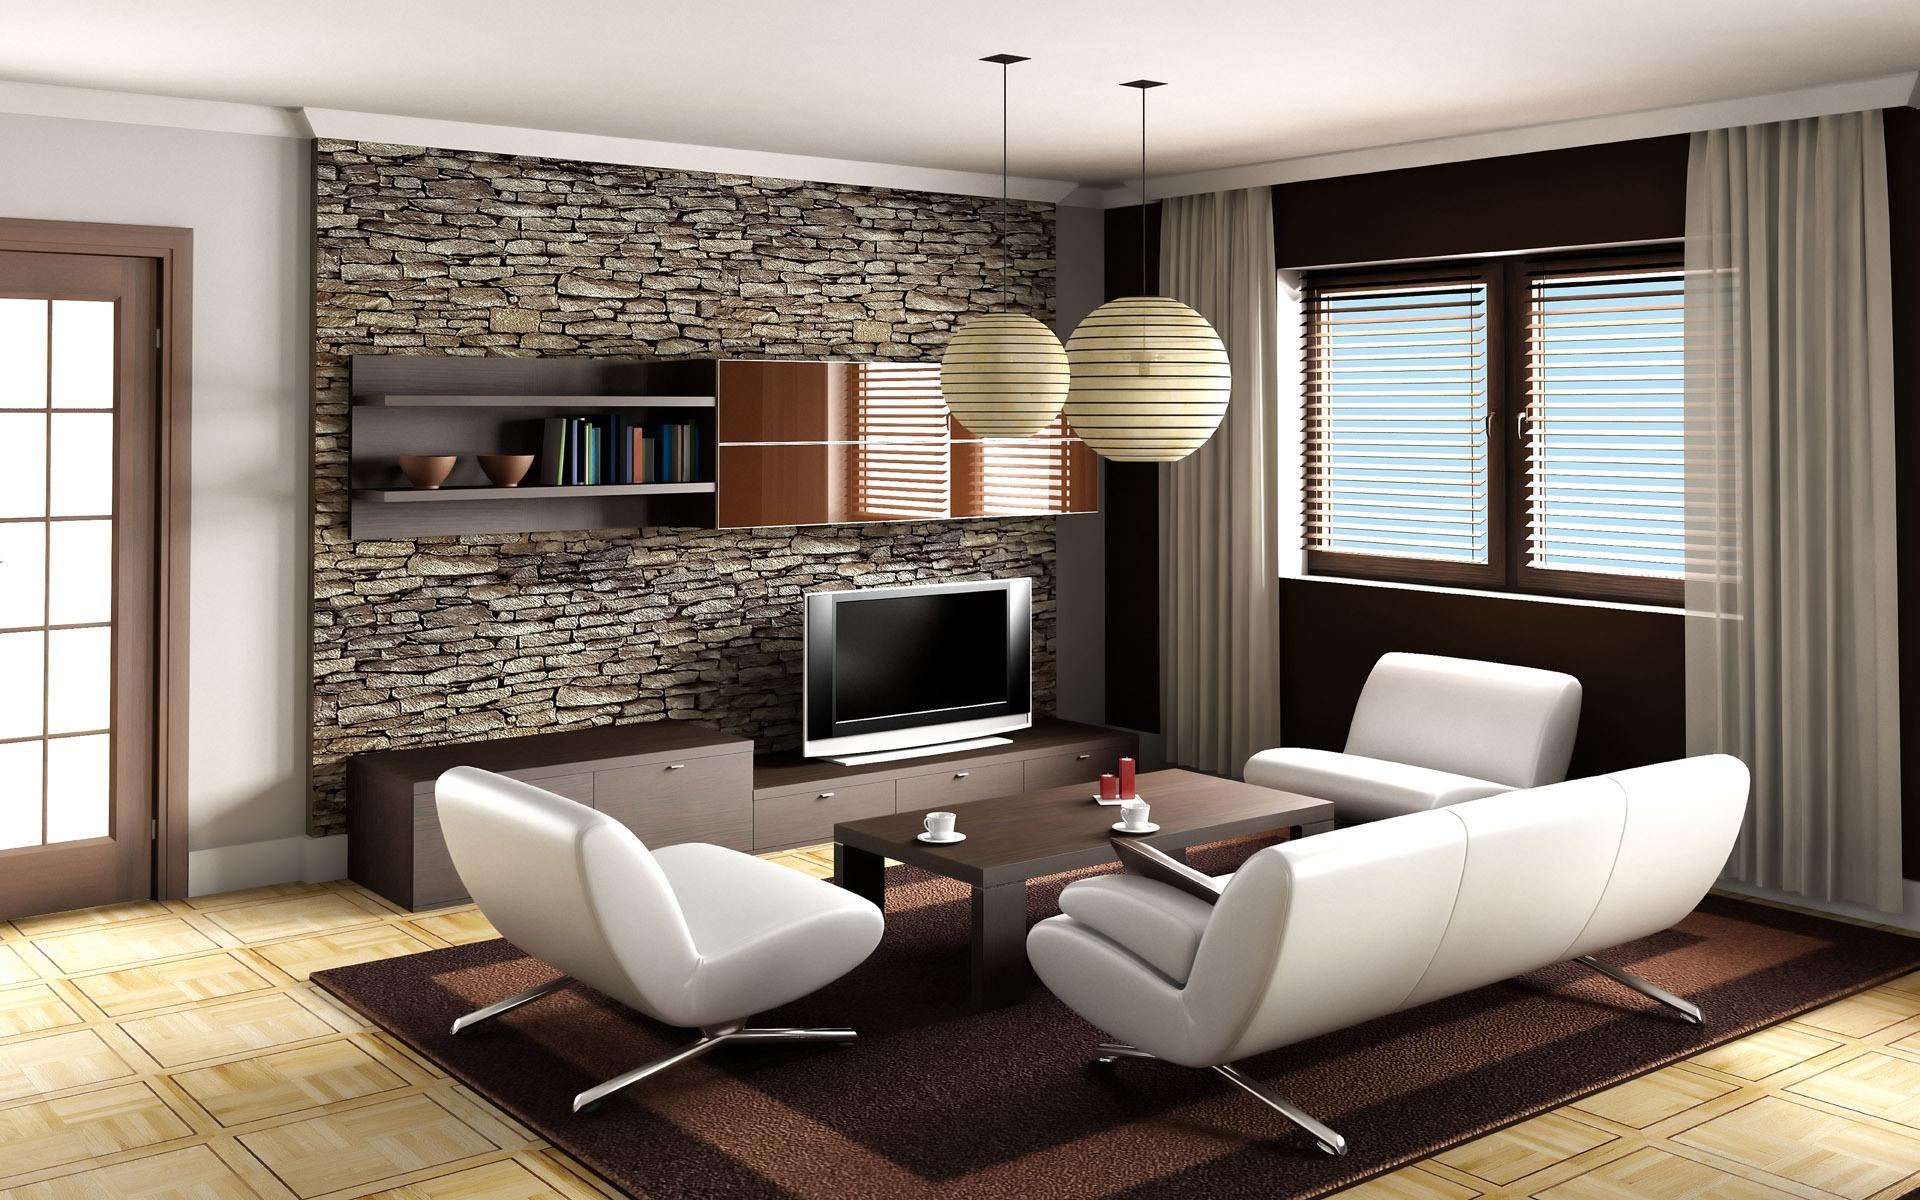 Lamp Curtains Sofas Tv Shelf Table Rug Home Design Ideas